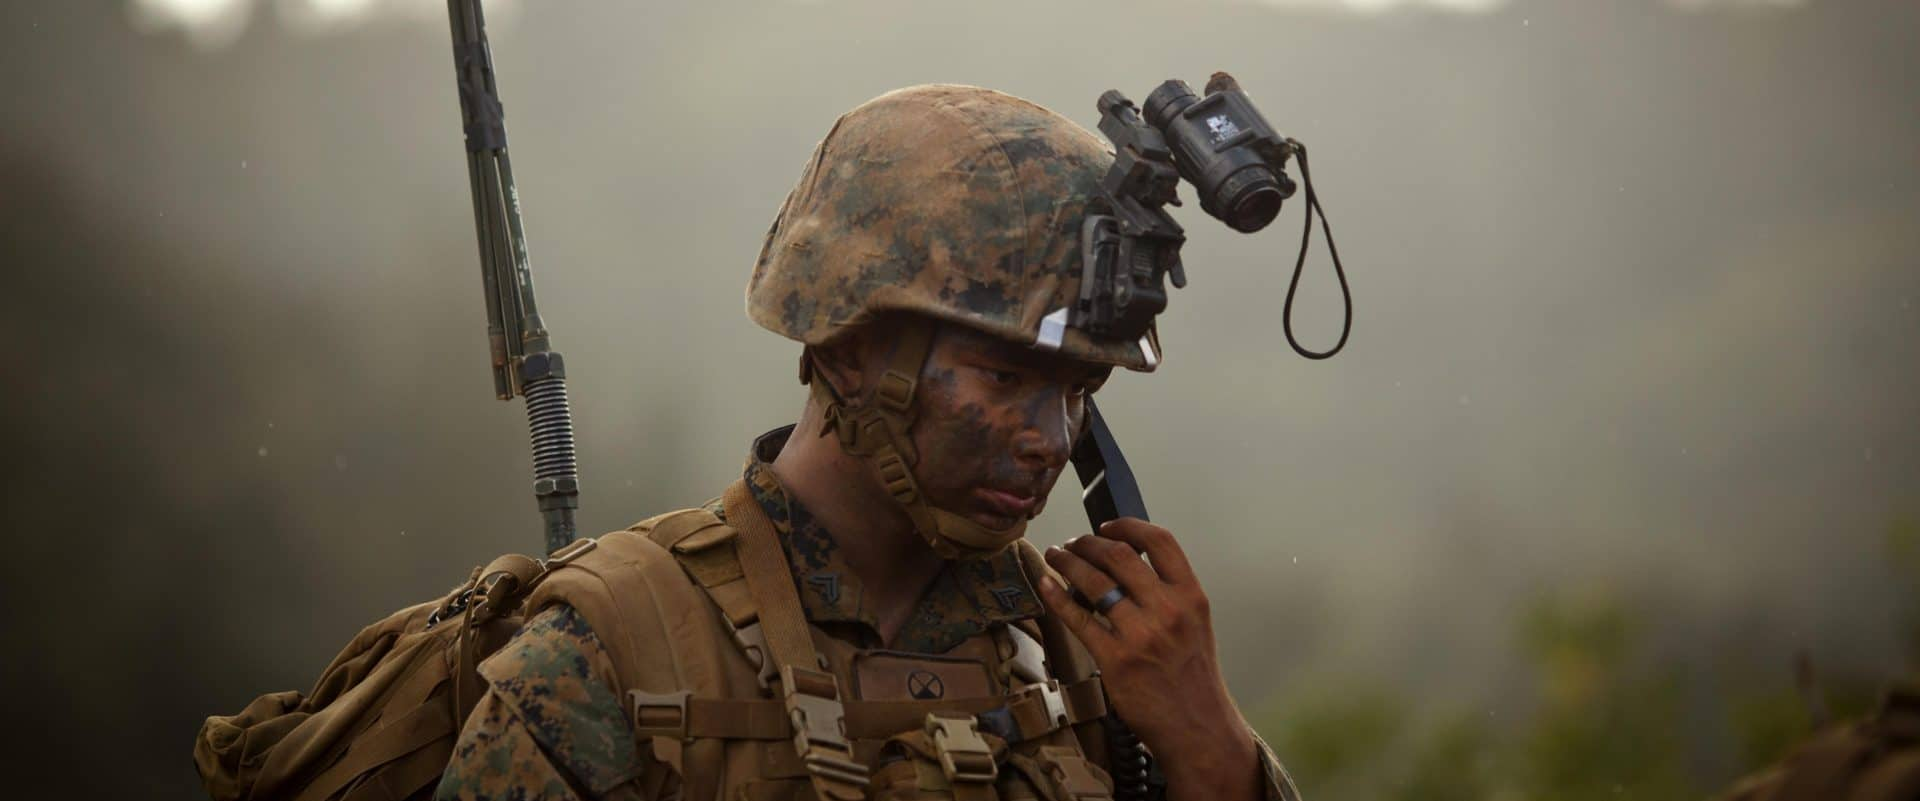 Contact, author David McCaleb, image showing US Marine talking on radio